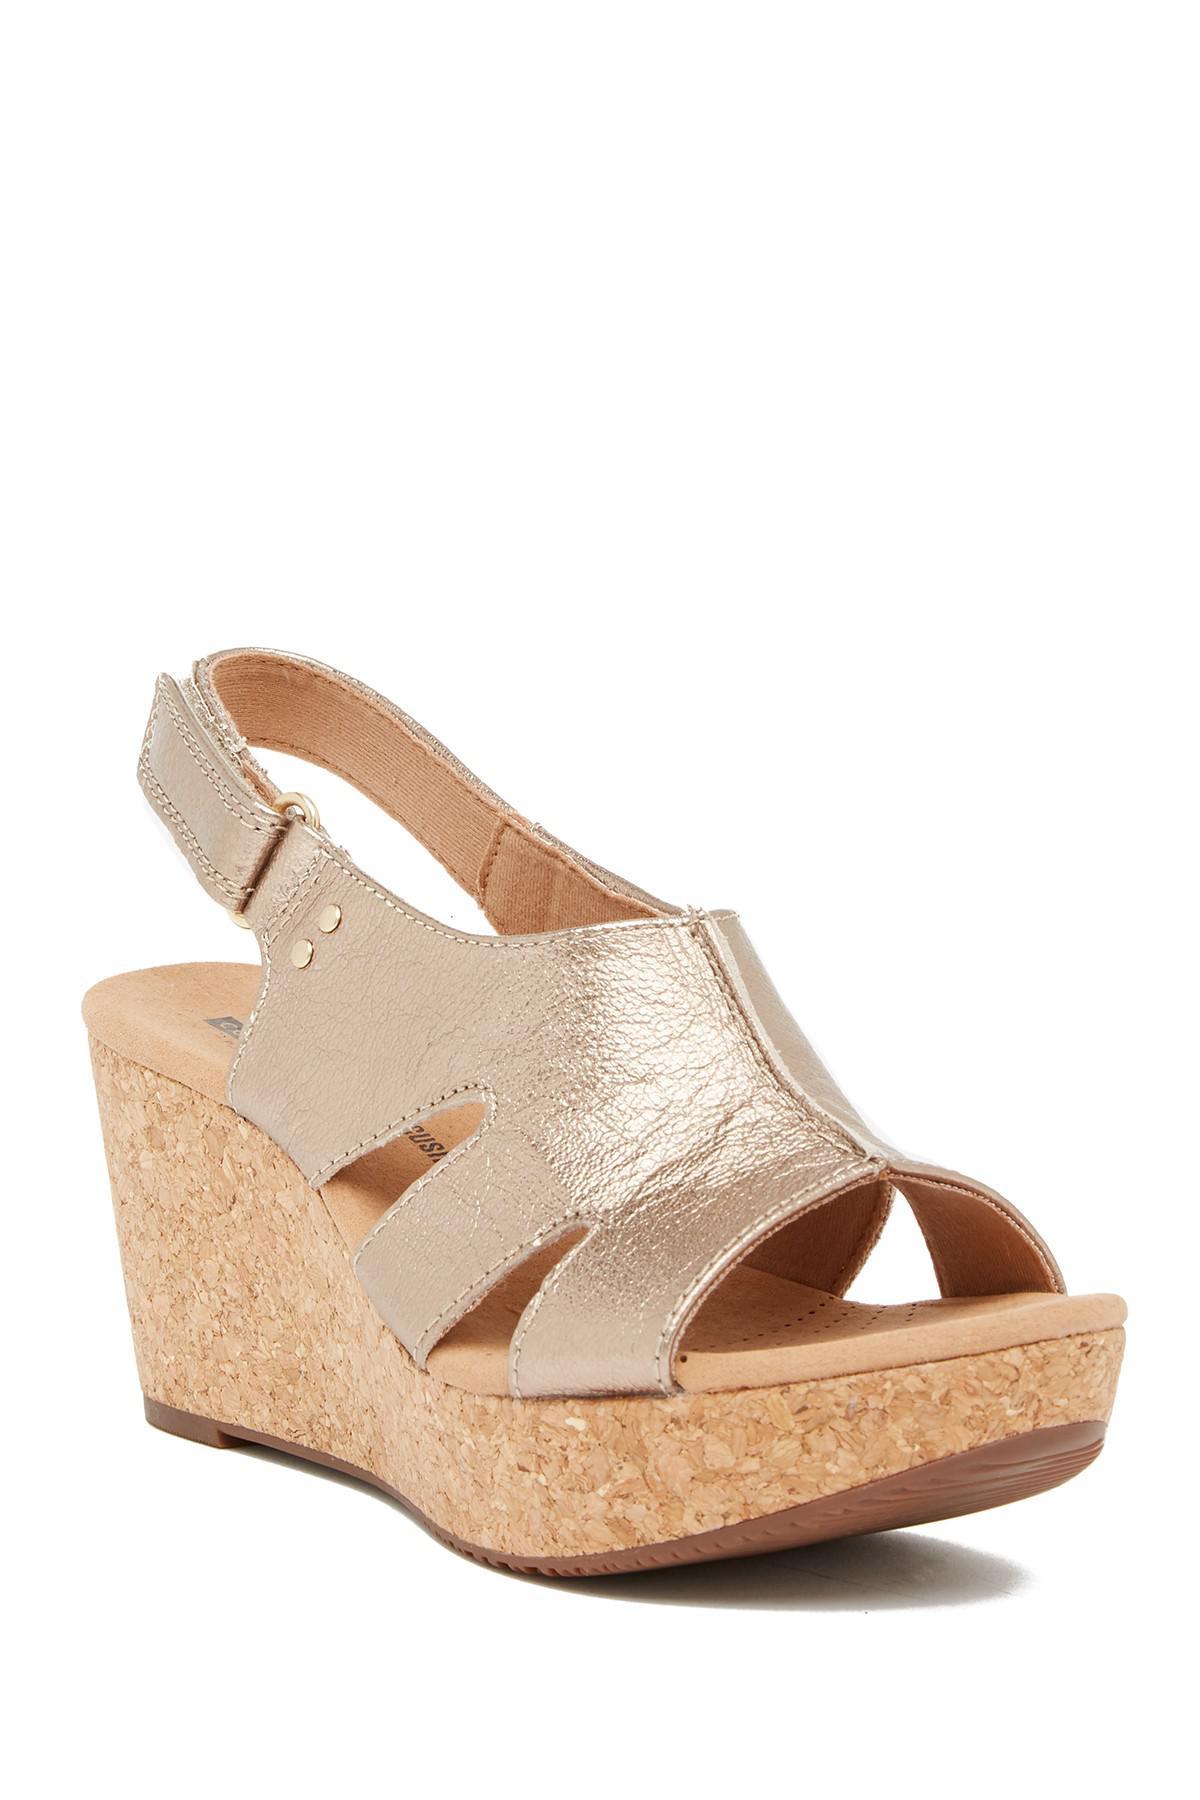 1c74818c7117 Clarks. Women s Annadel Bari Platform Wedge Sandal